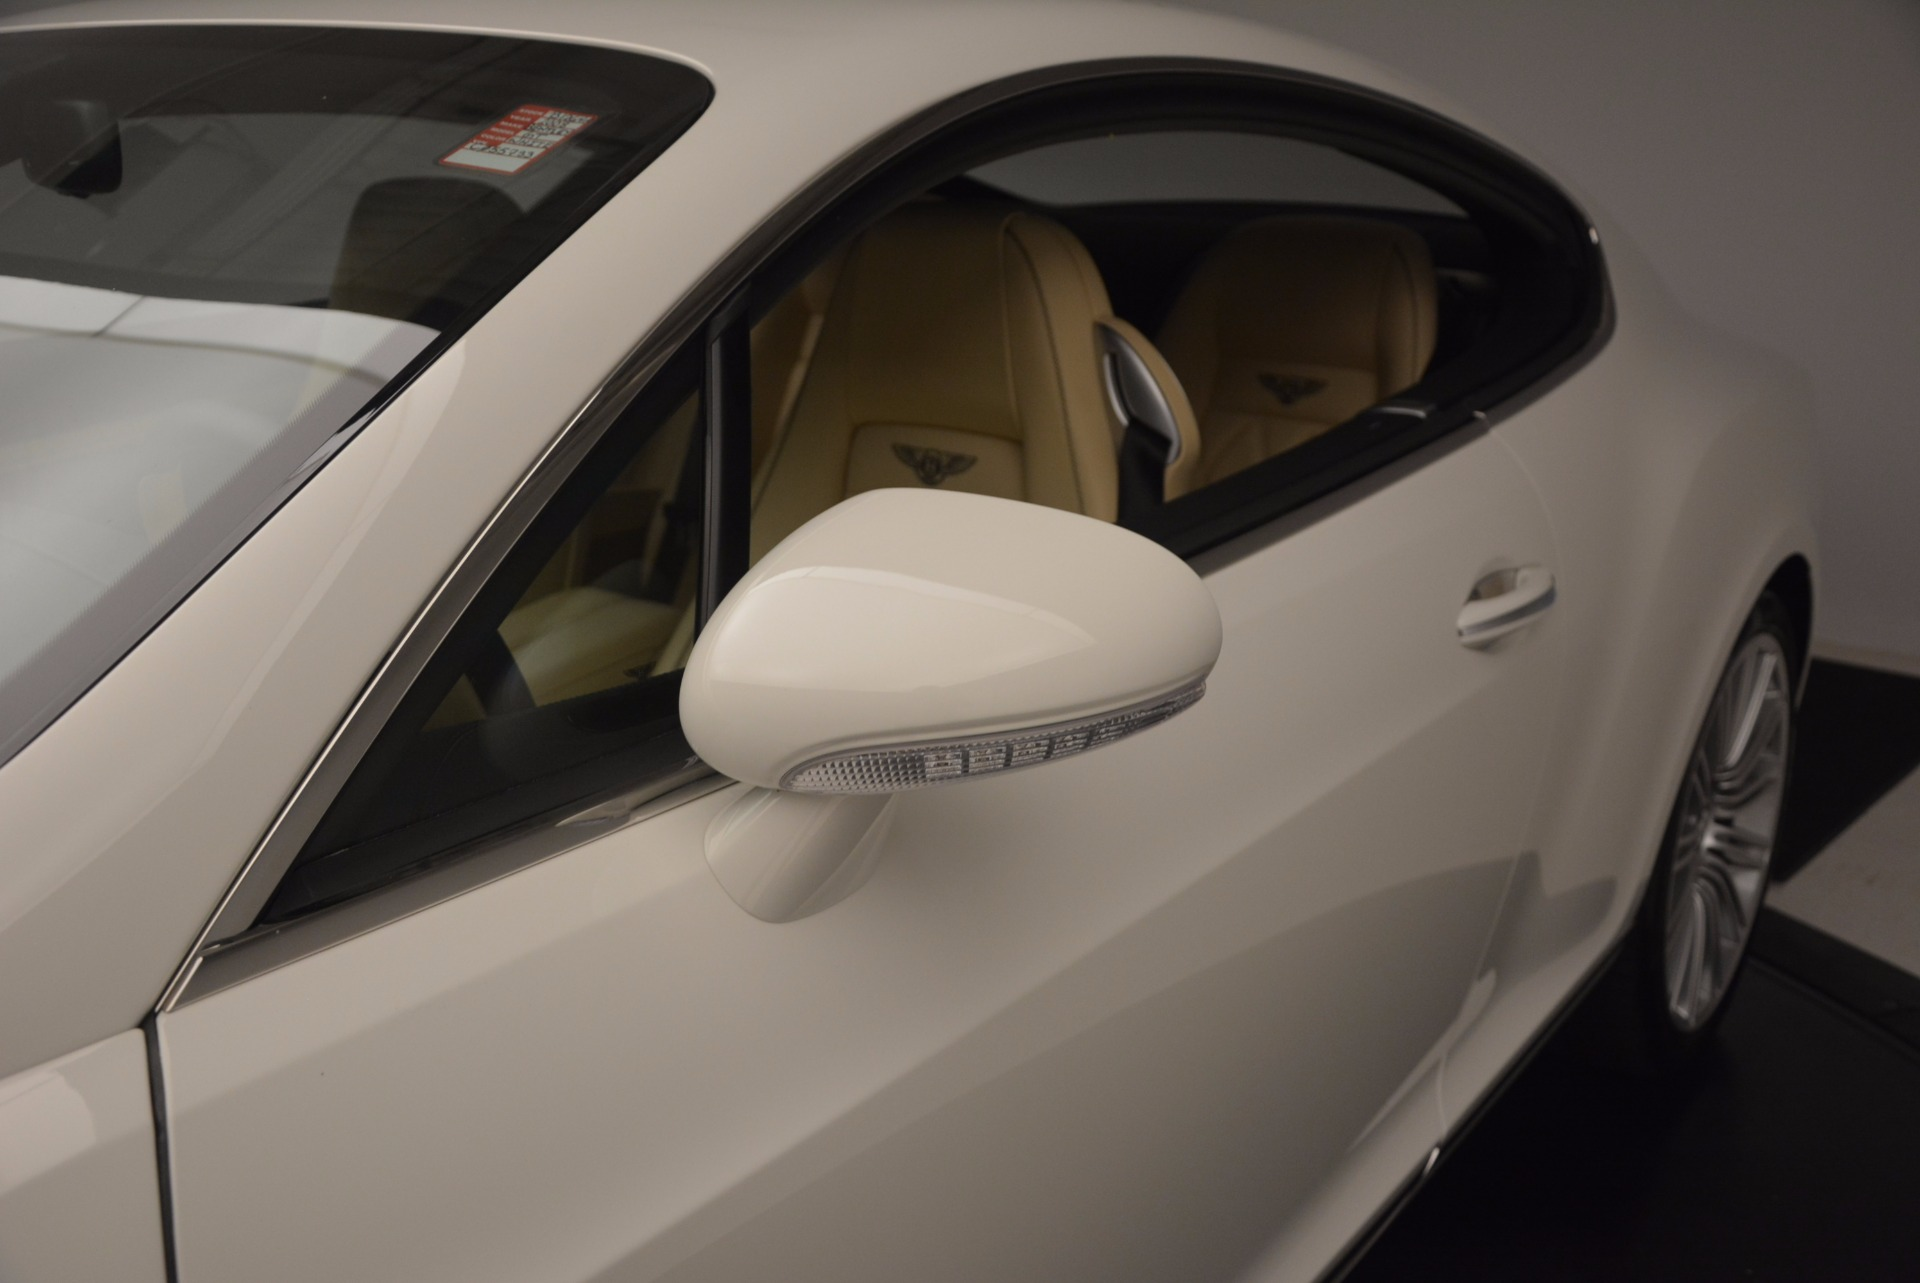 Used 2008 Bentley Continental GT Speed For Sale In Westport, CT 1552_p18